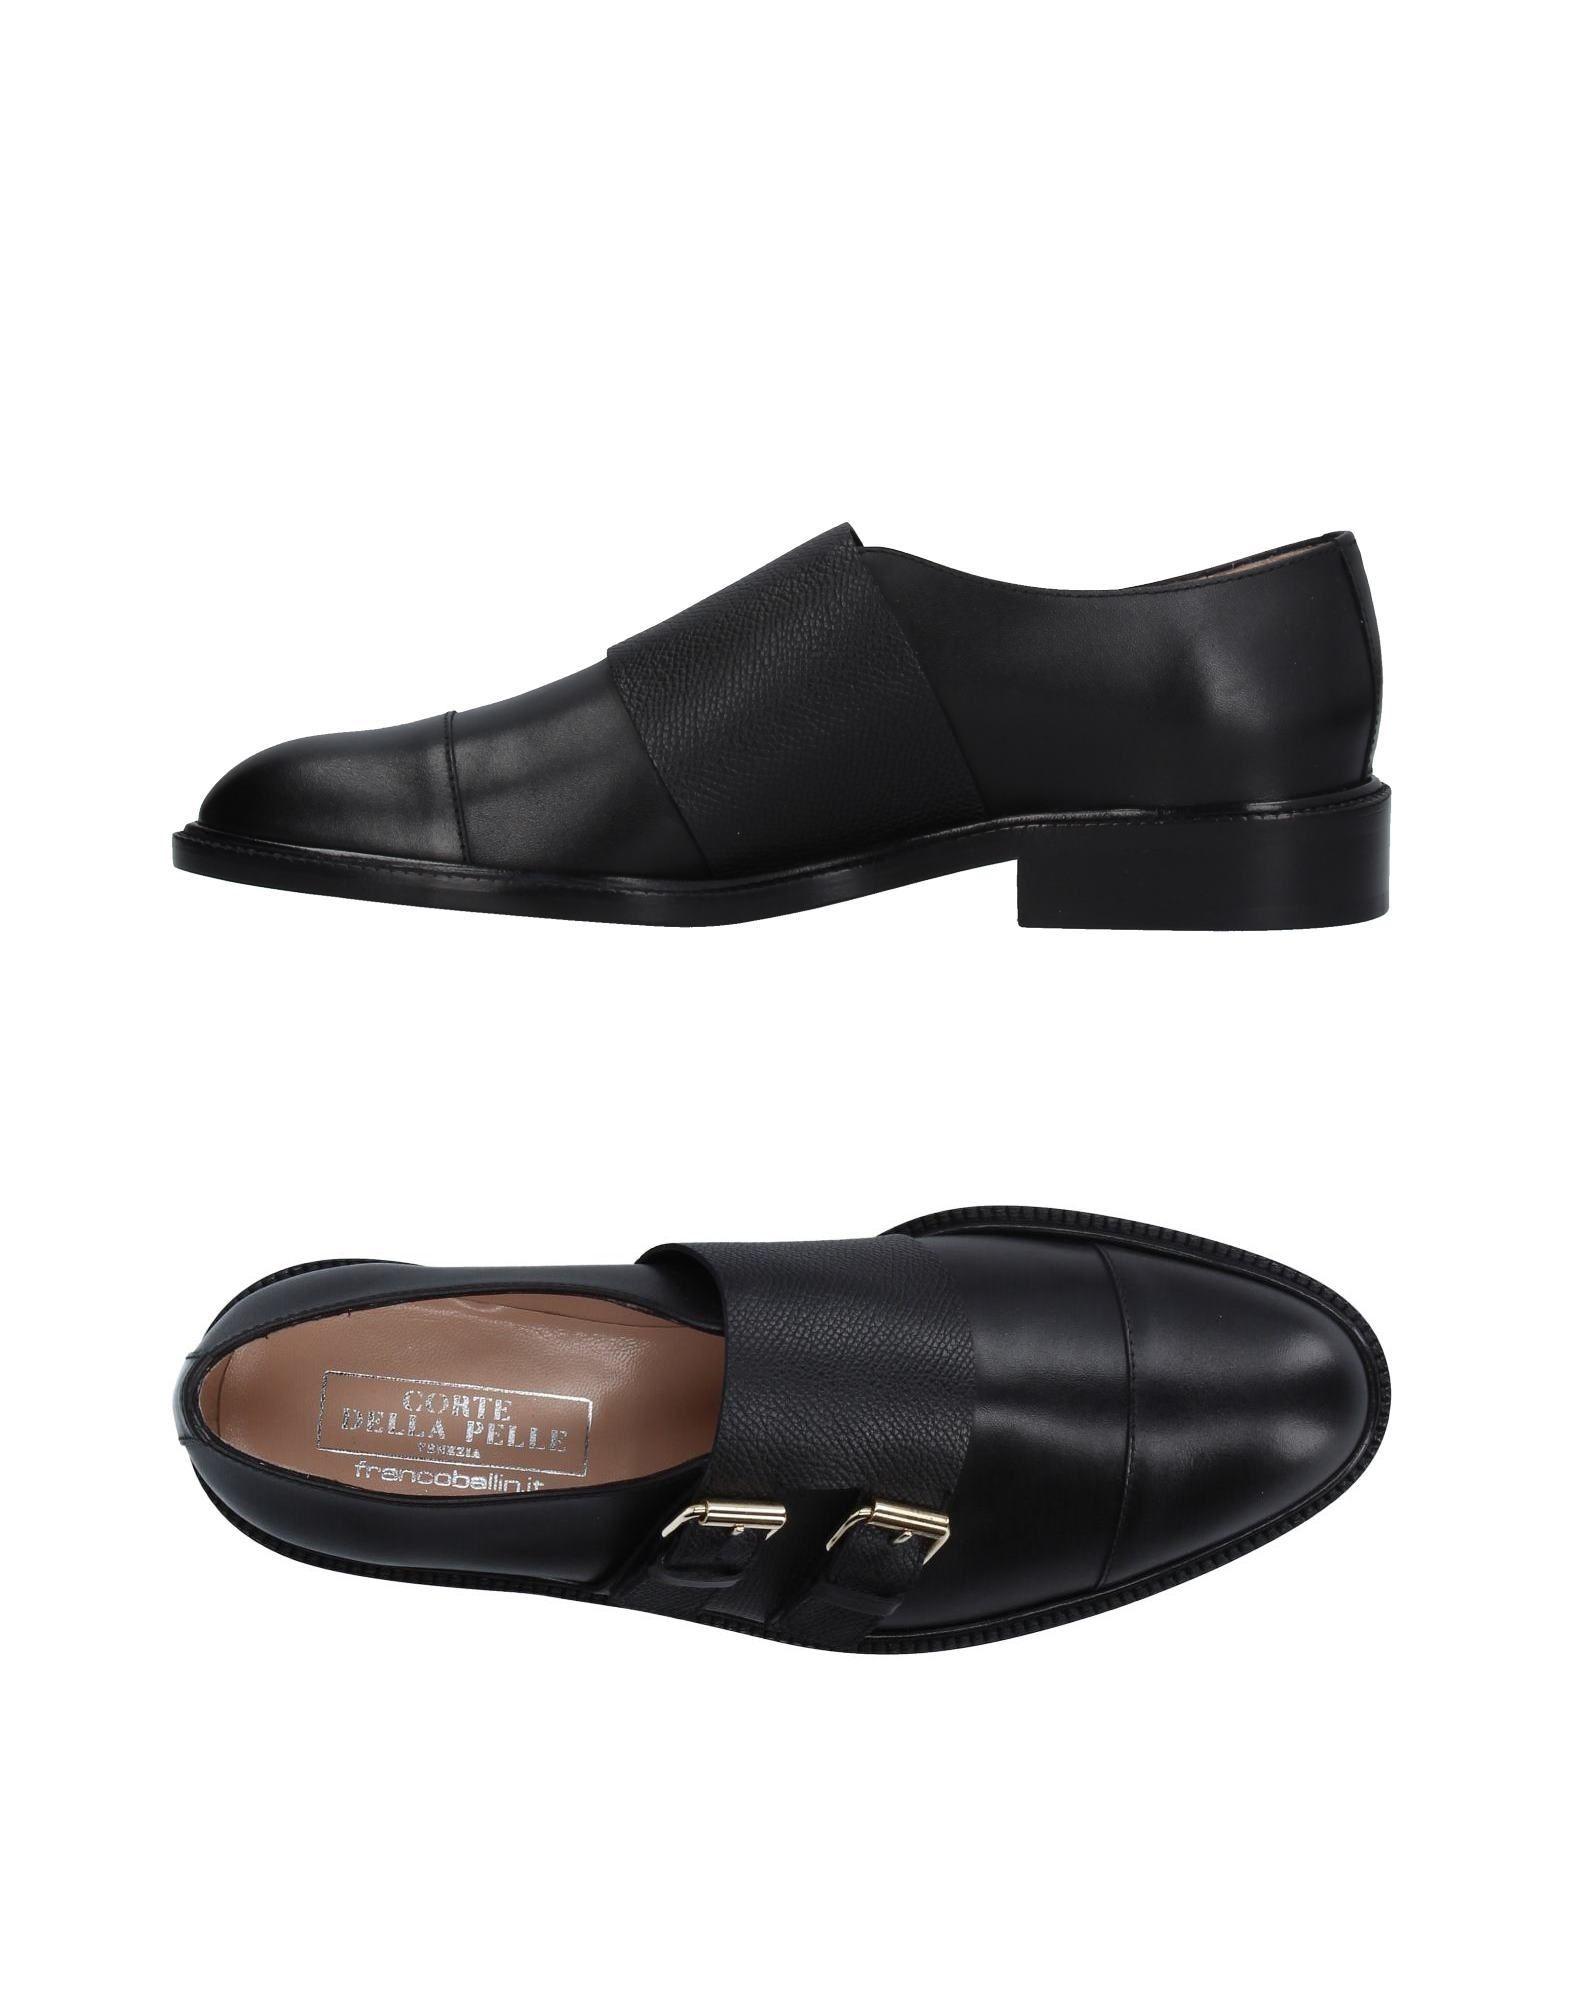 La Corte Della Pelle By Franco Ballin Mokassins Damen  11224553CQ Gute Qualität beliebte Schuhe